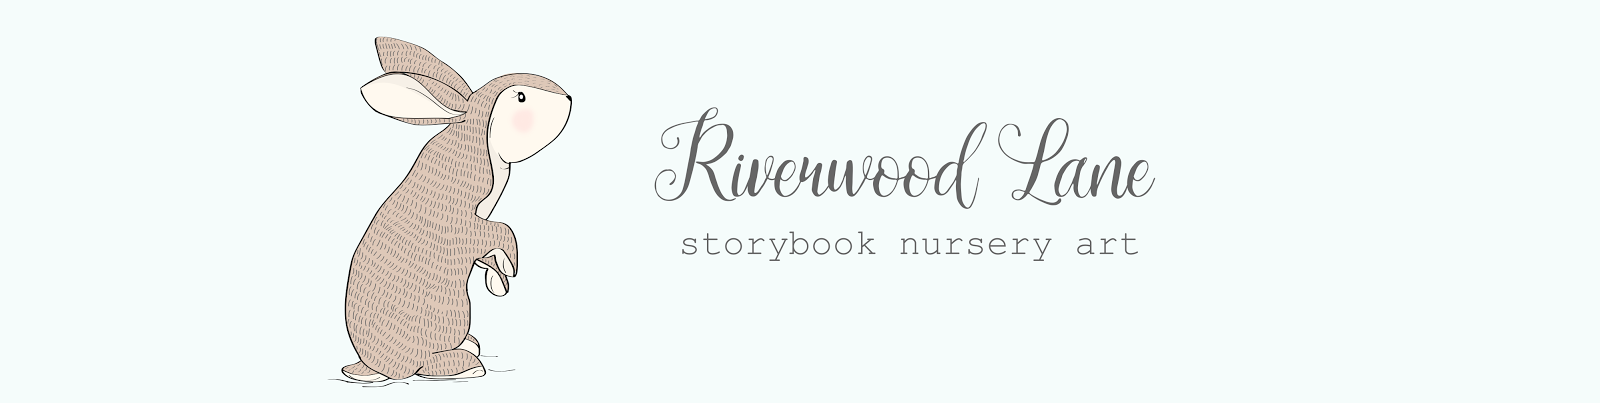 Riverwood Lane